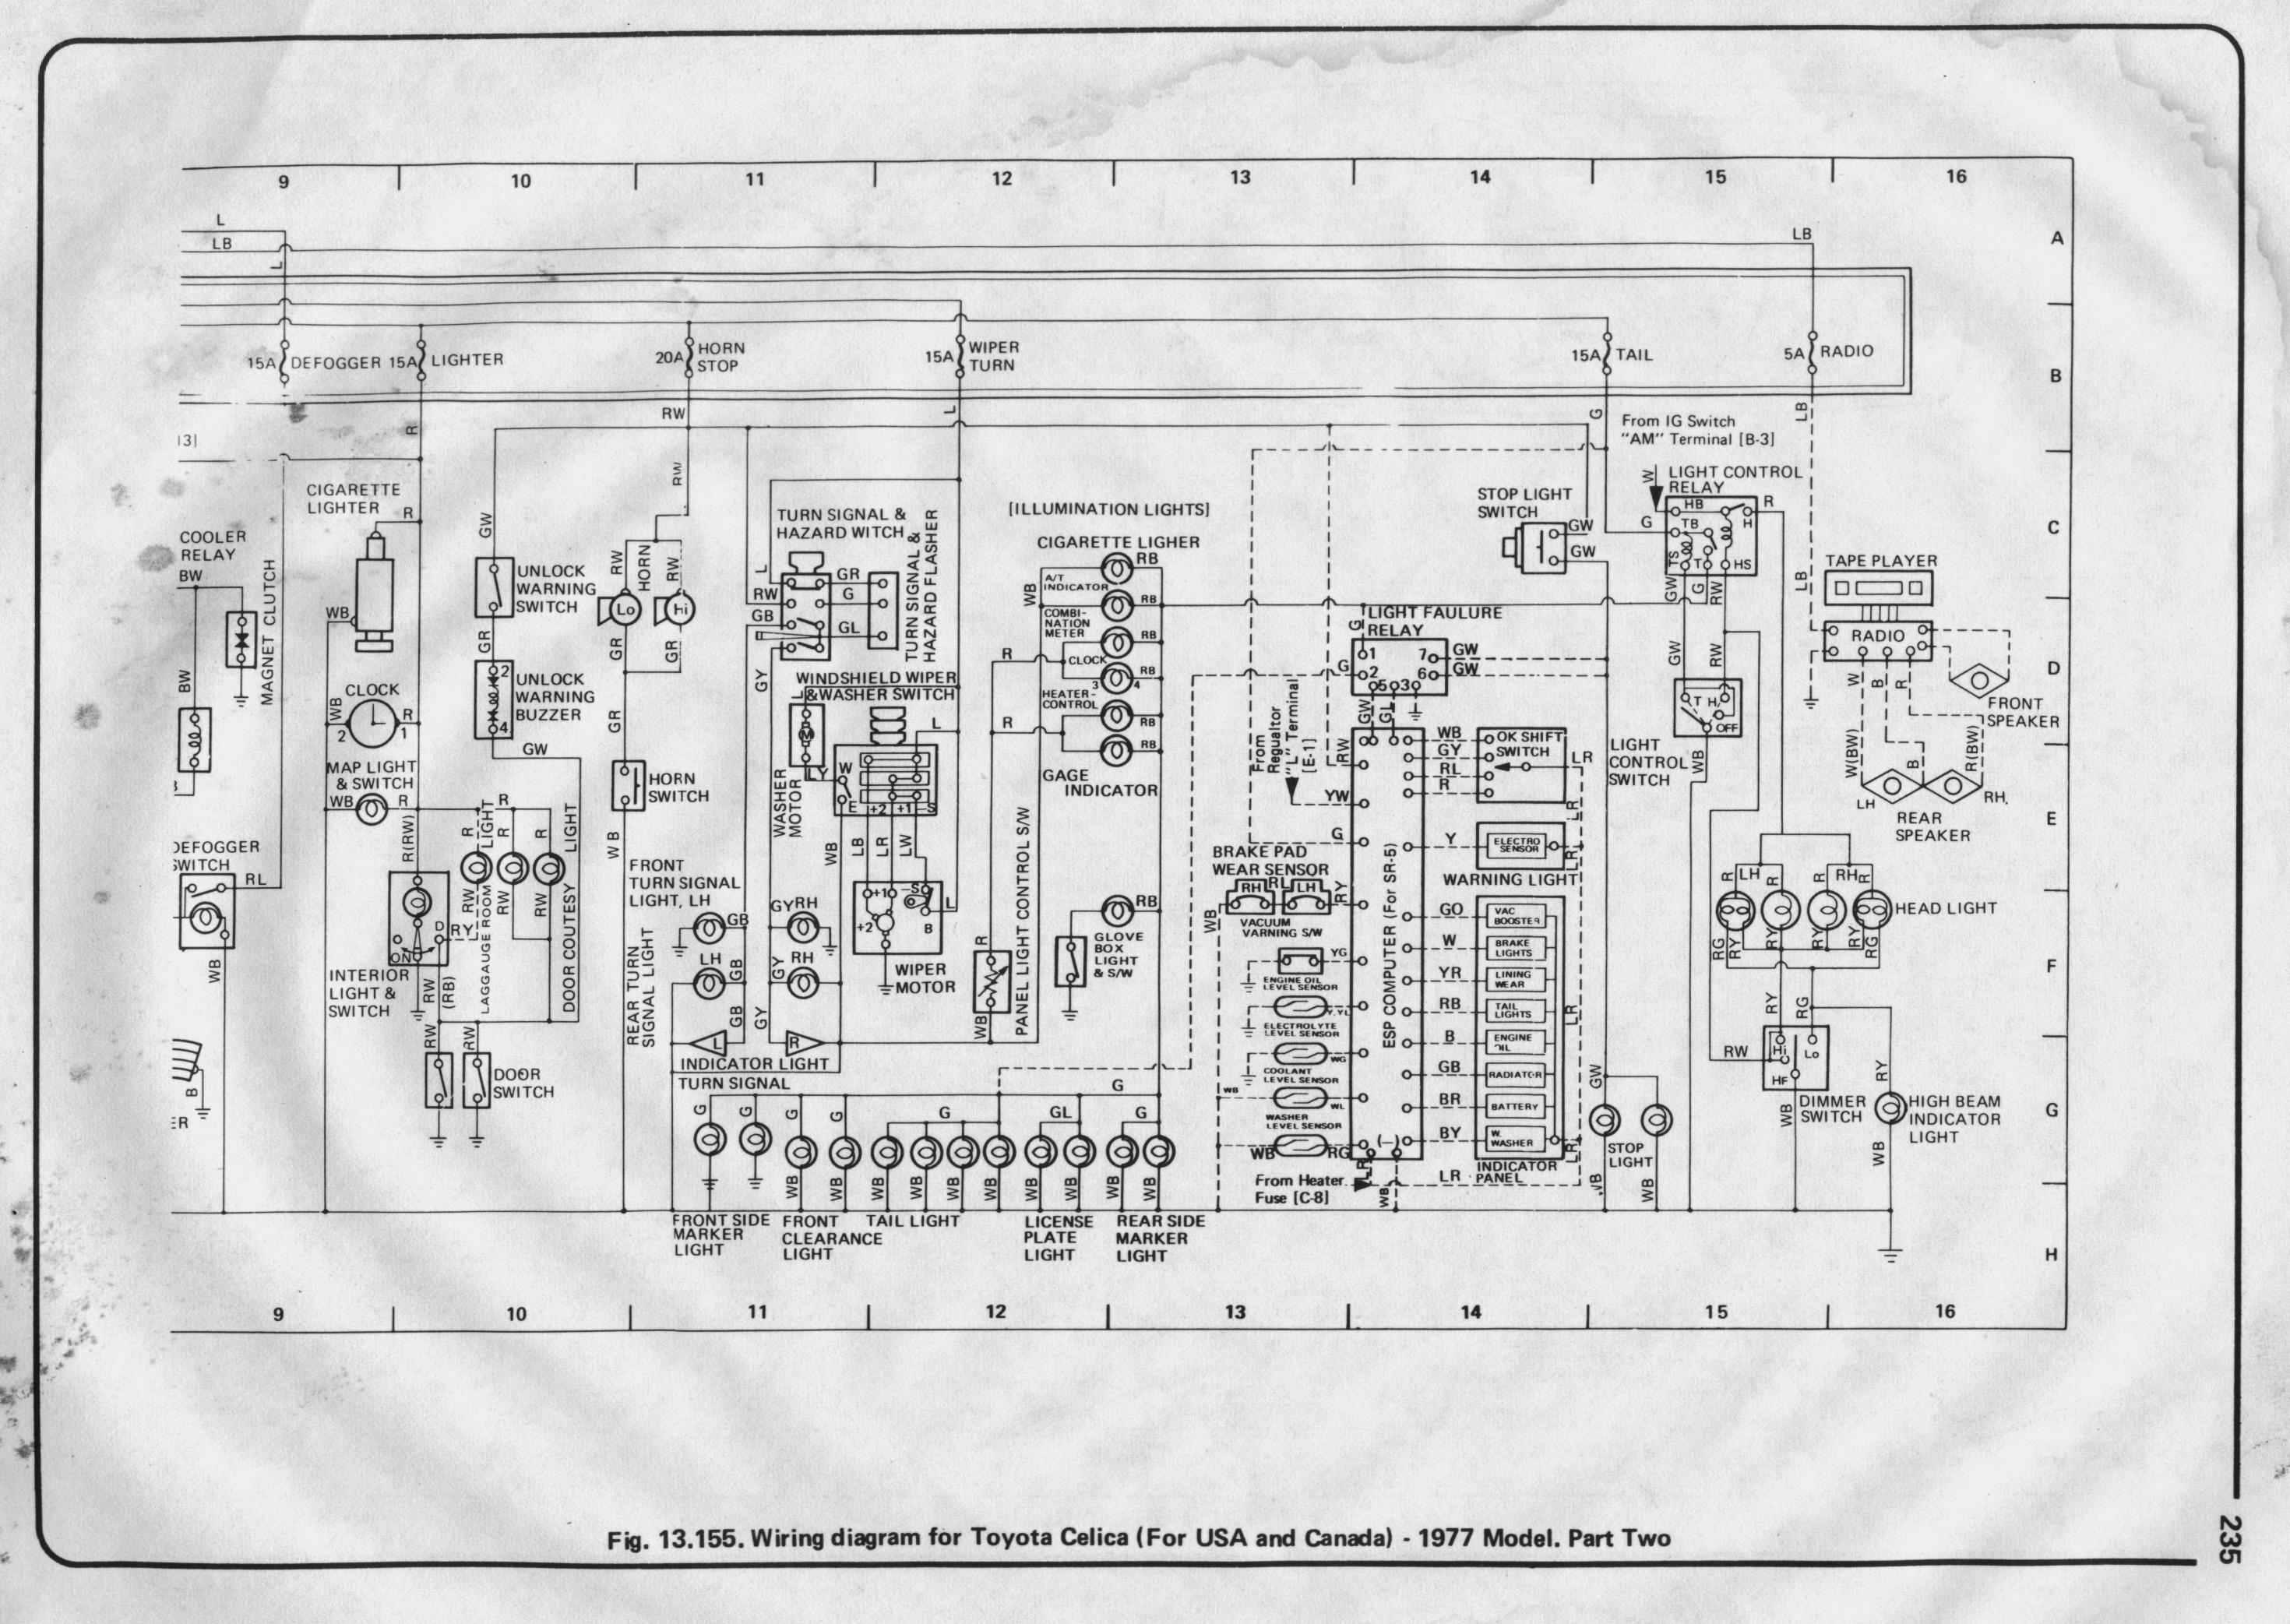 Famous 3000gt Ecu Diagram Pdf Adornment - Simple Wiring Diagram ...